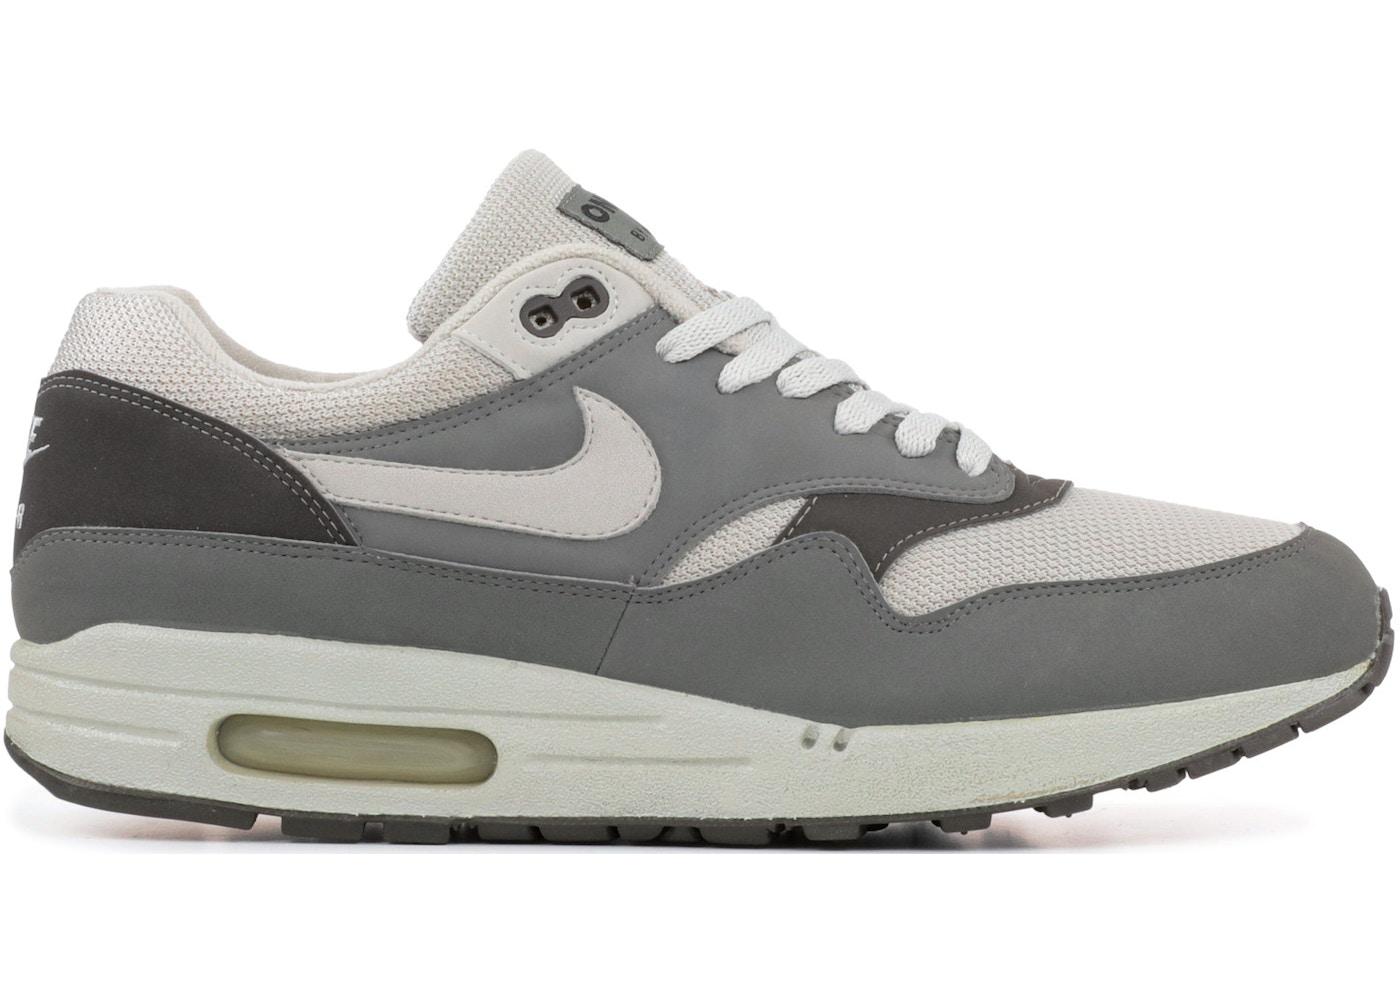 Nike Air Max 1 Grey One - 308866-001